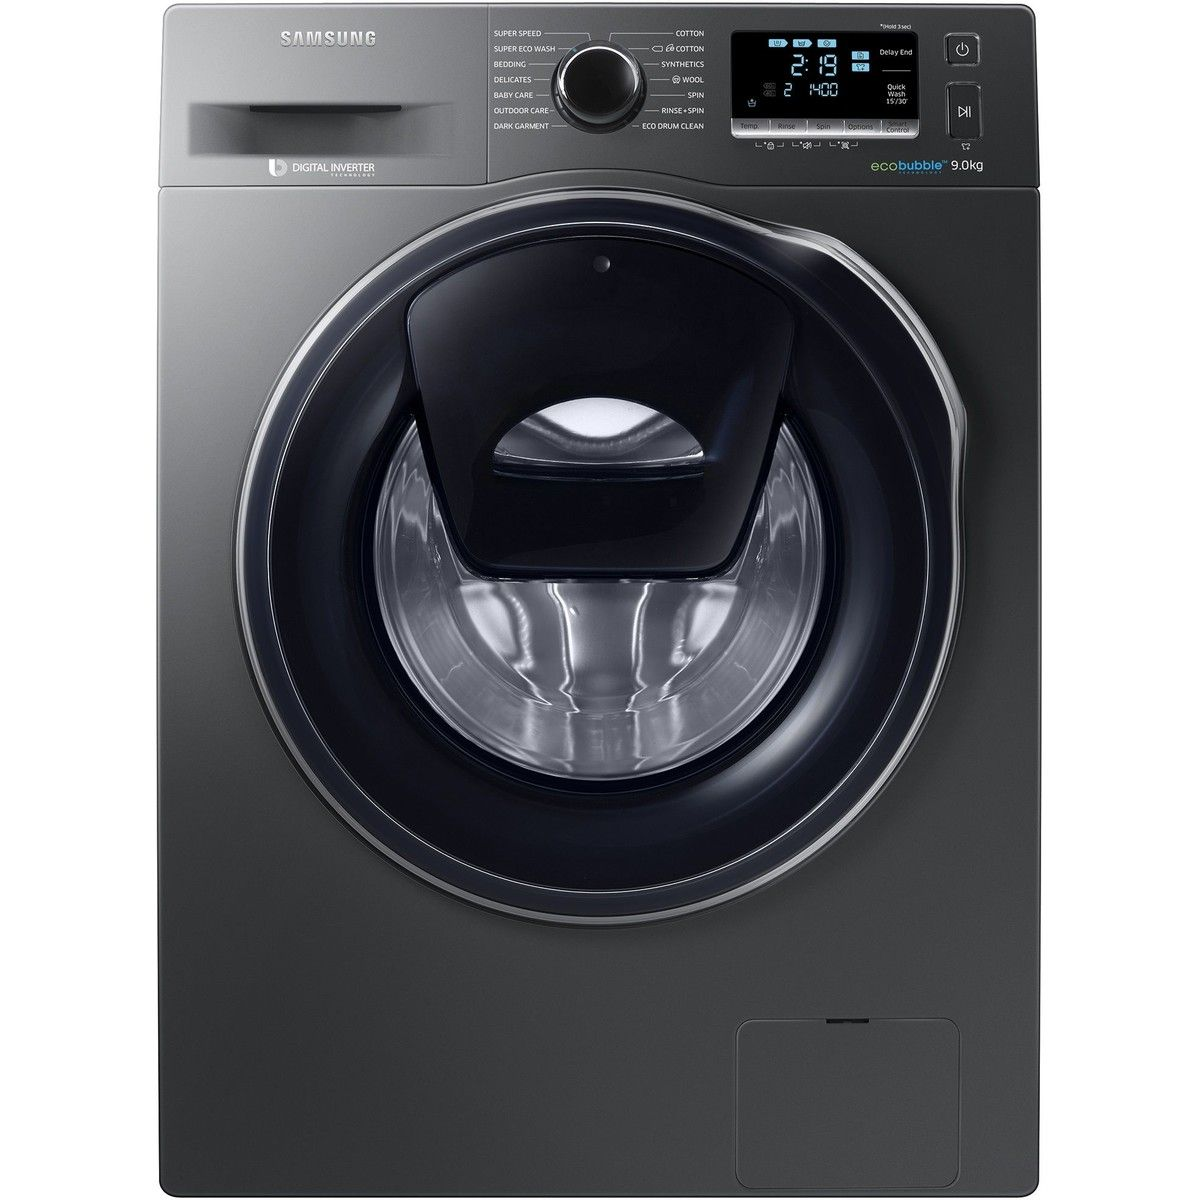 Masina De Spalat Rufe Samsung Ww90k6414qx 1400 Rpm 9 Kg Clasa A Negru Waschmaschine Samsung Wasche